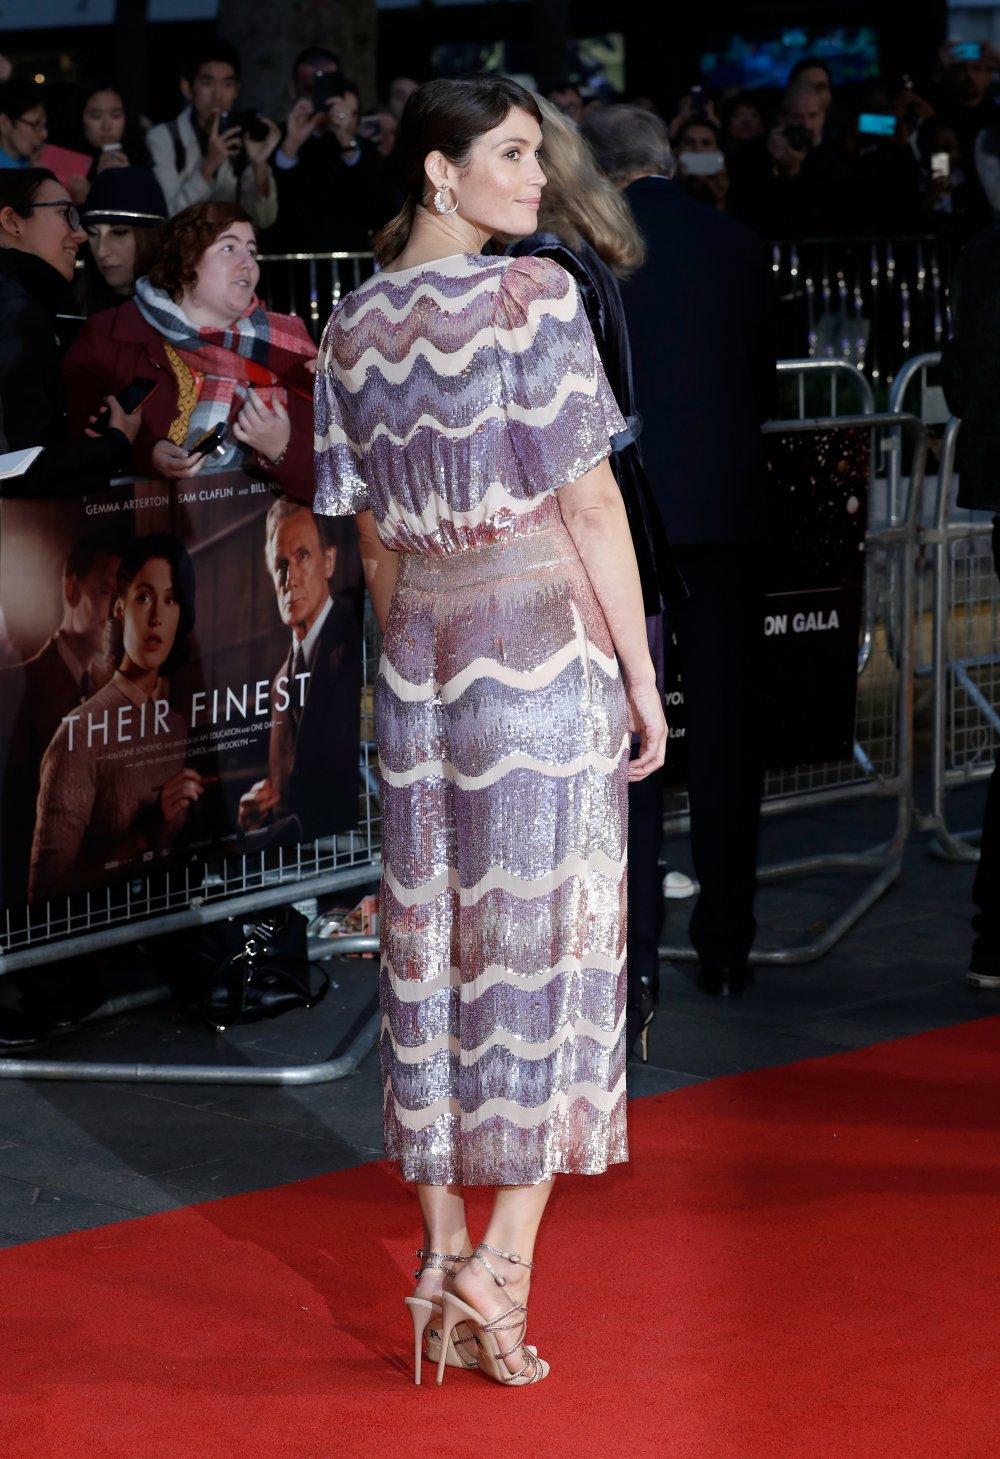 Gemma Arterton attends the Mayor's Centrepiece Gala screening of Their Finest